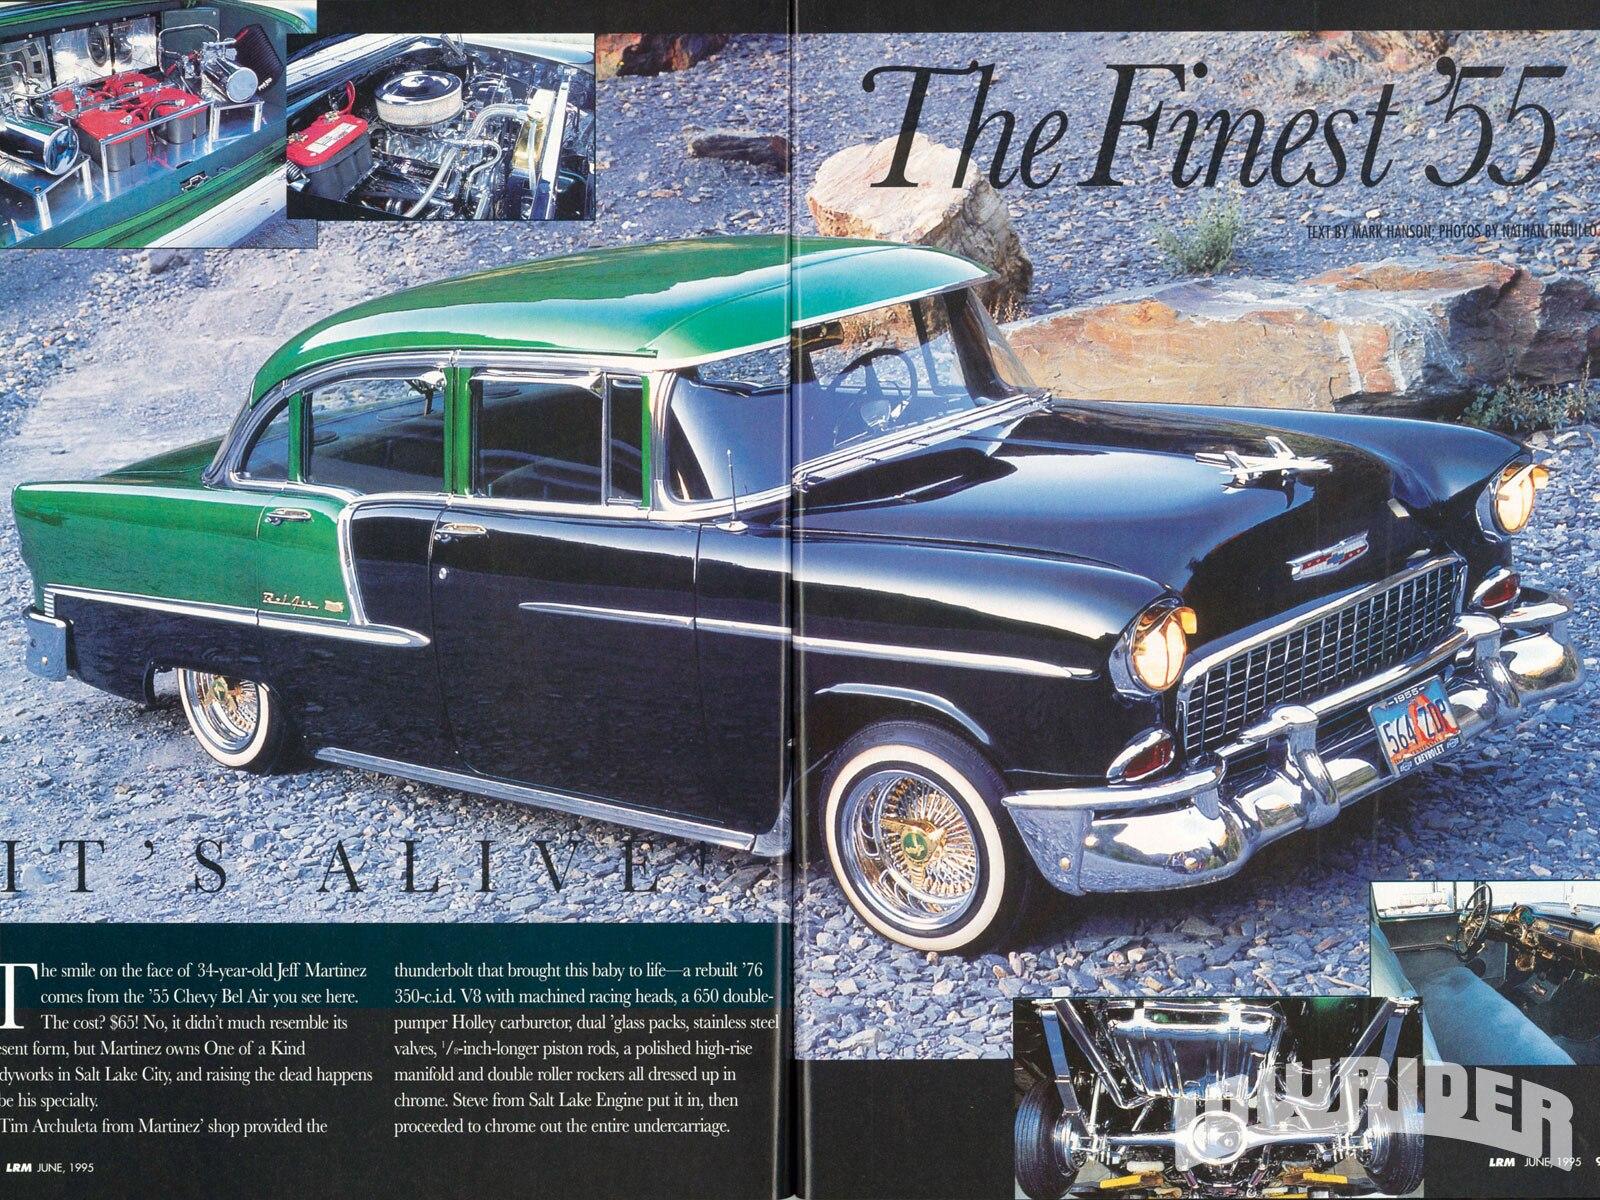 1209-lrmp-34-o-lowrider-magazine-1995-1996-classic-lowrider